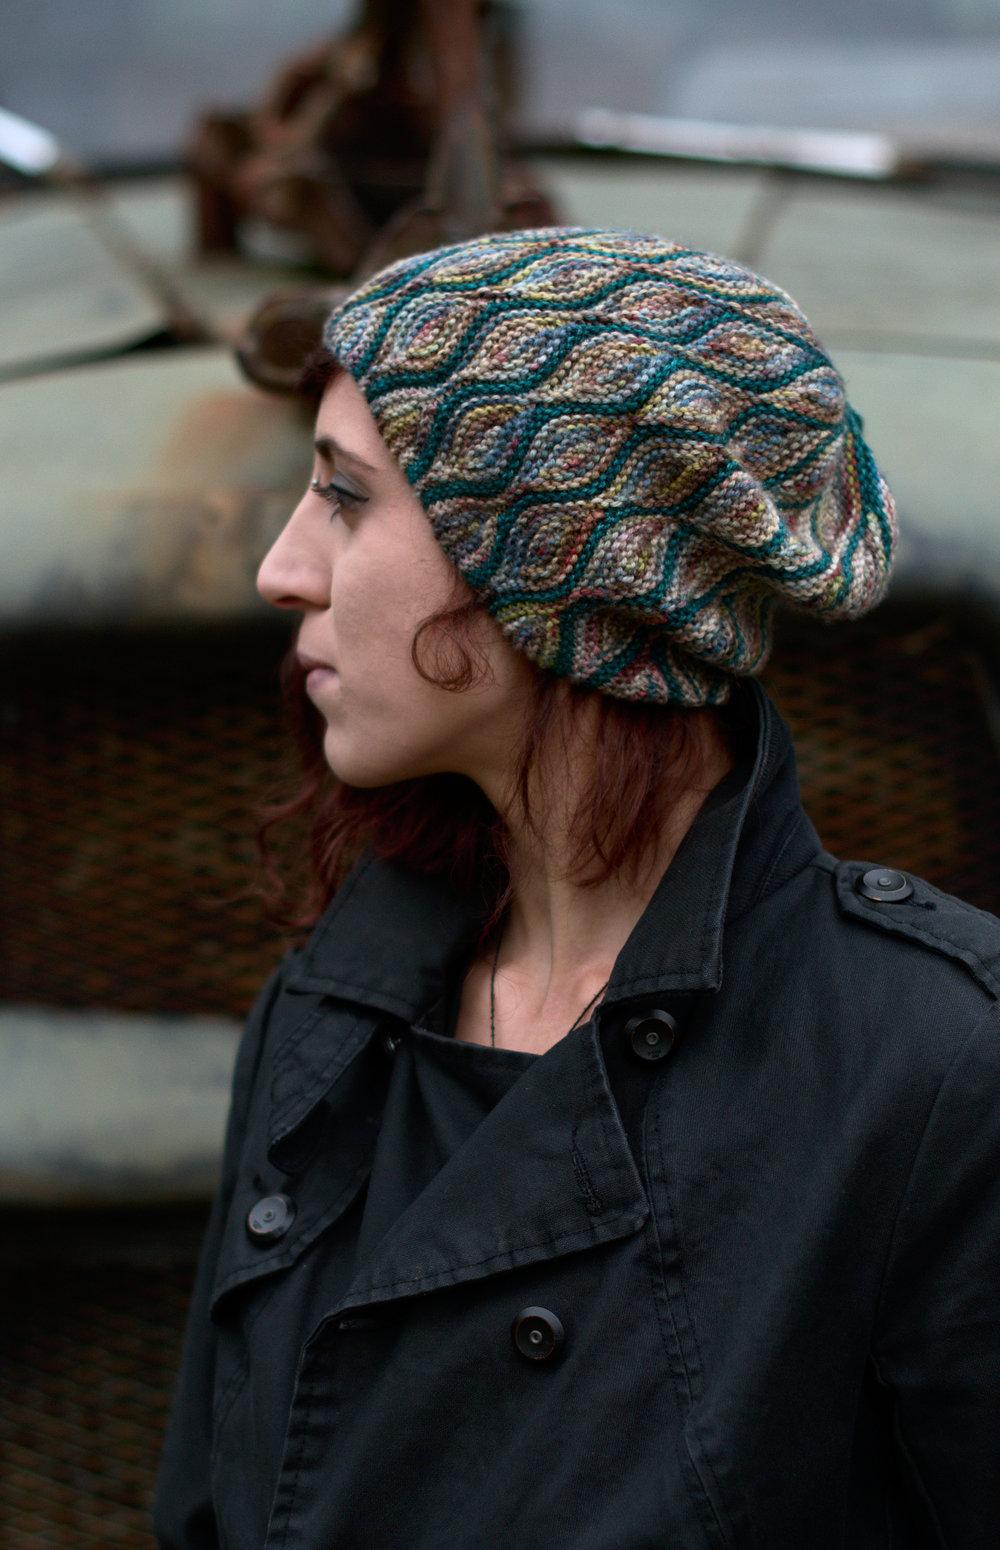 Rhinebeck hat sideways knit short row slouchy hat hand knitting pattern